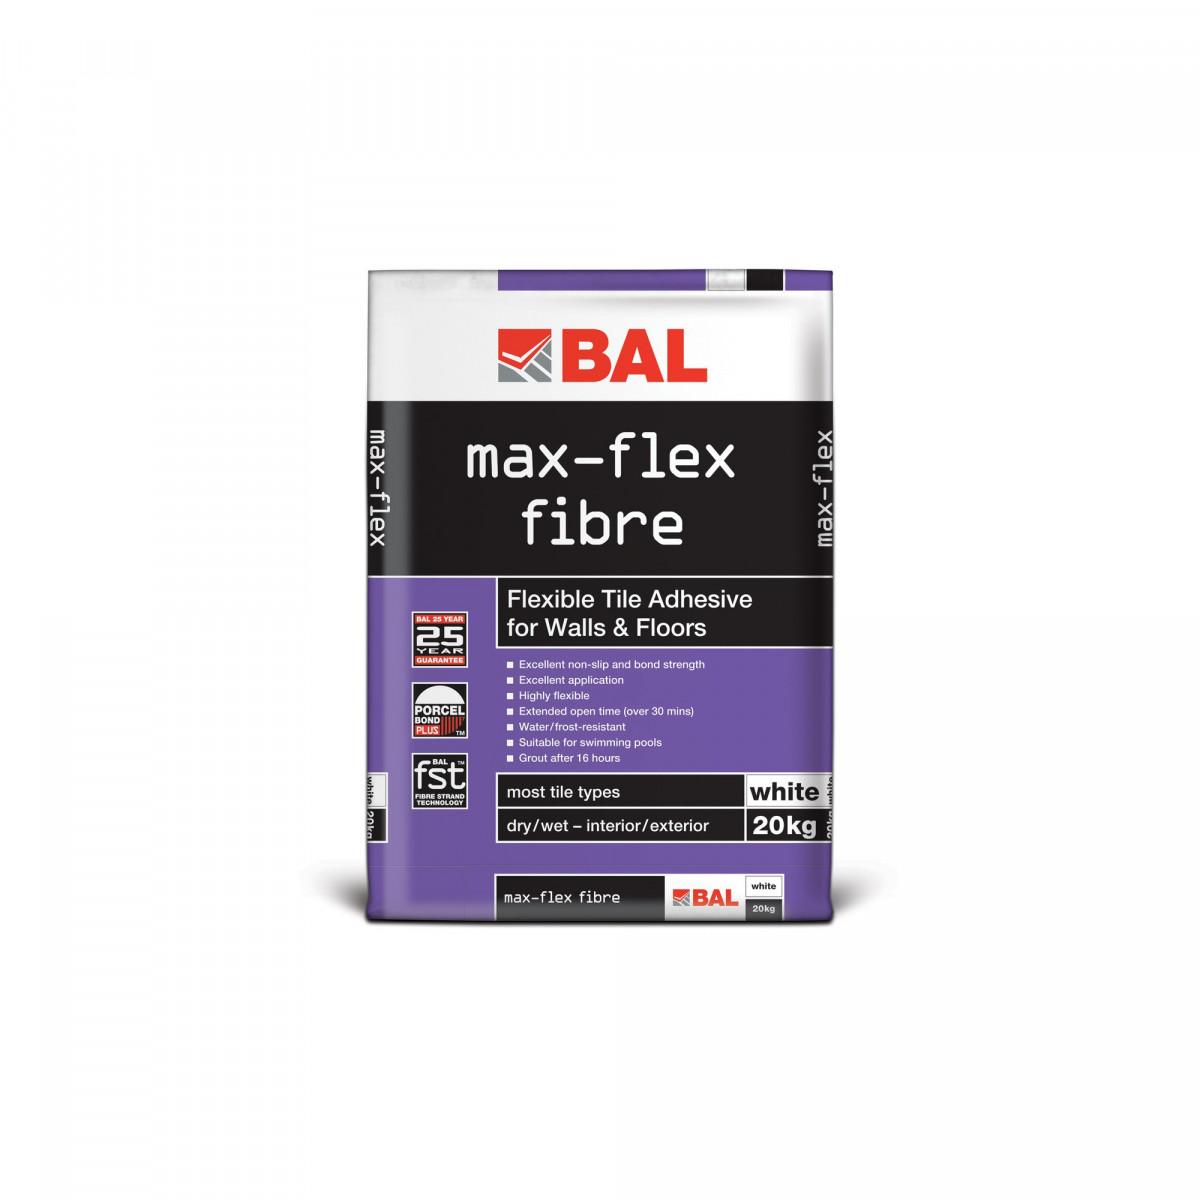 BAL Adhesive BAL Max-flex Fibre Adhesive White 20KG